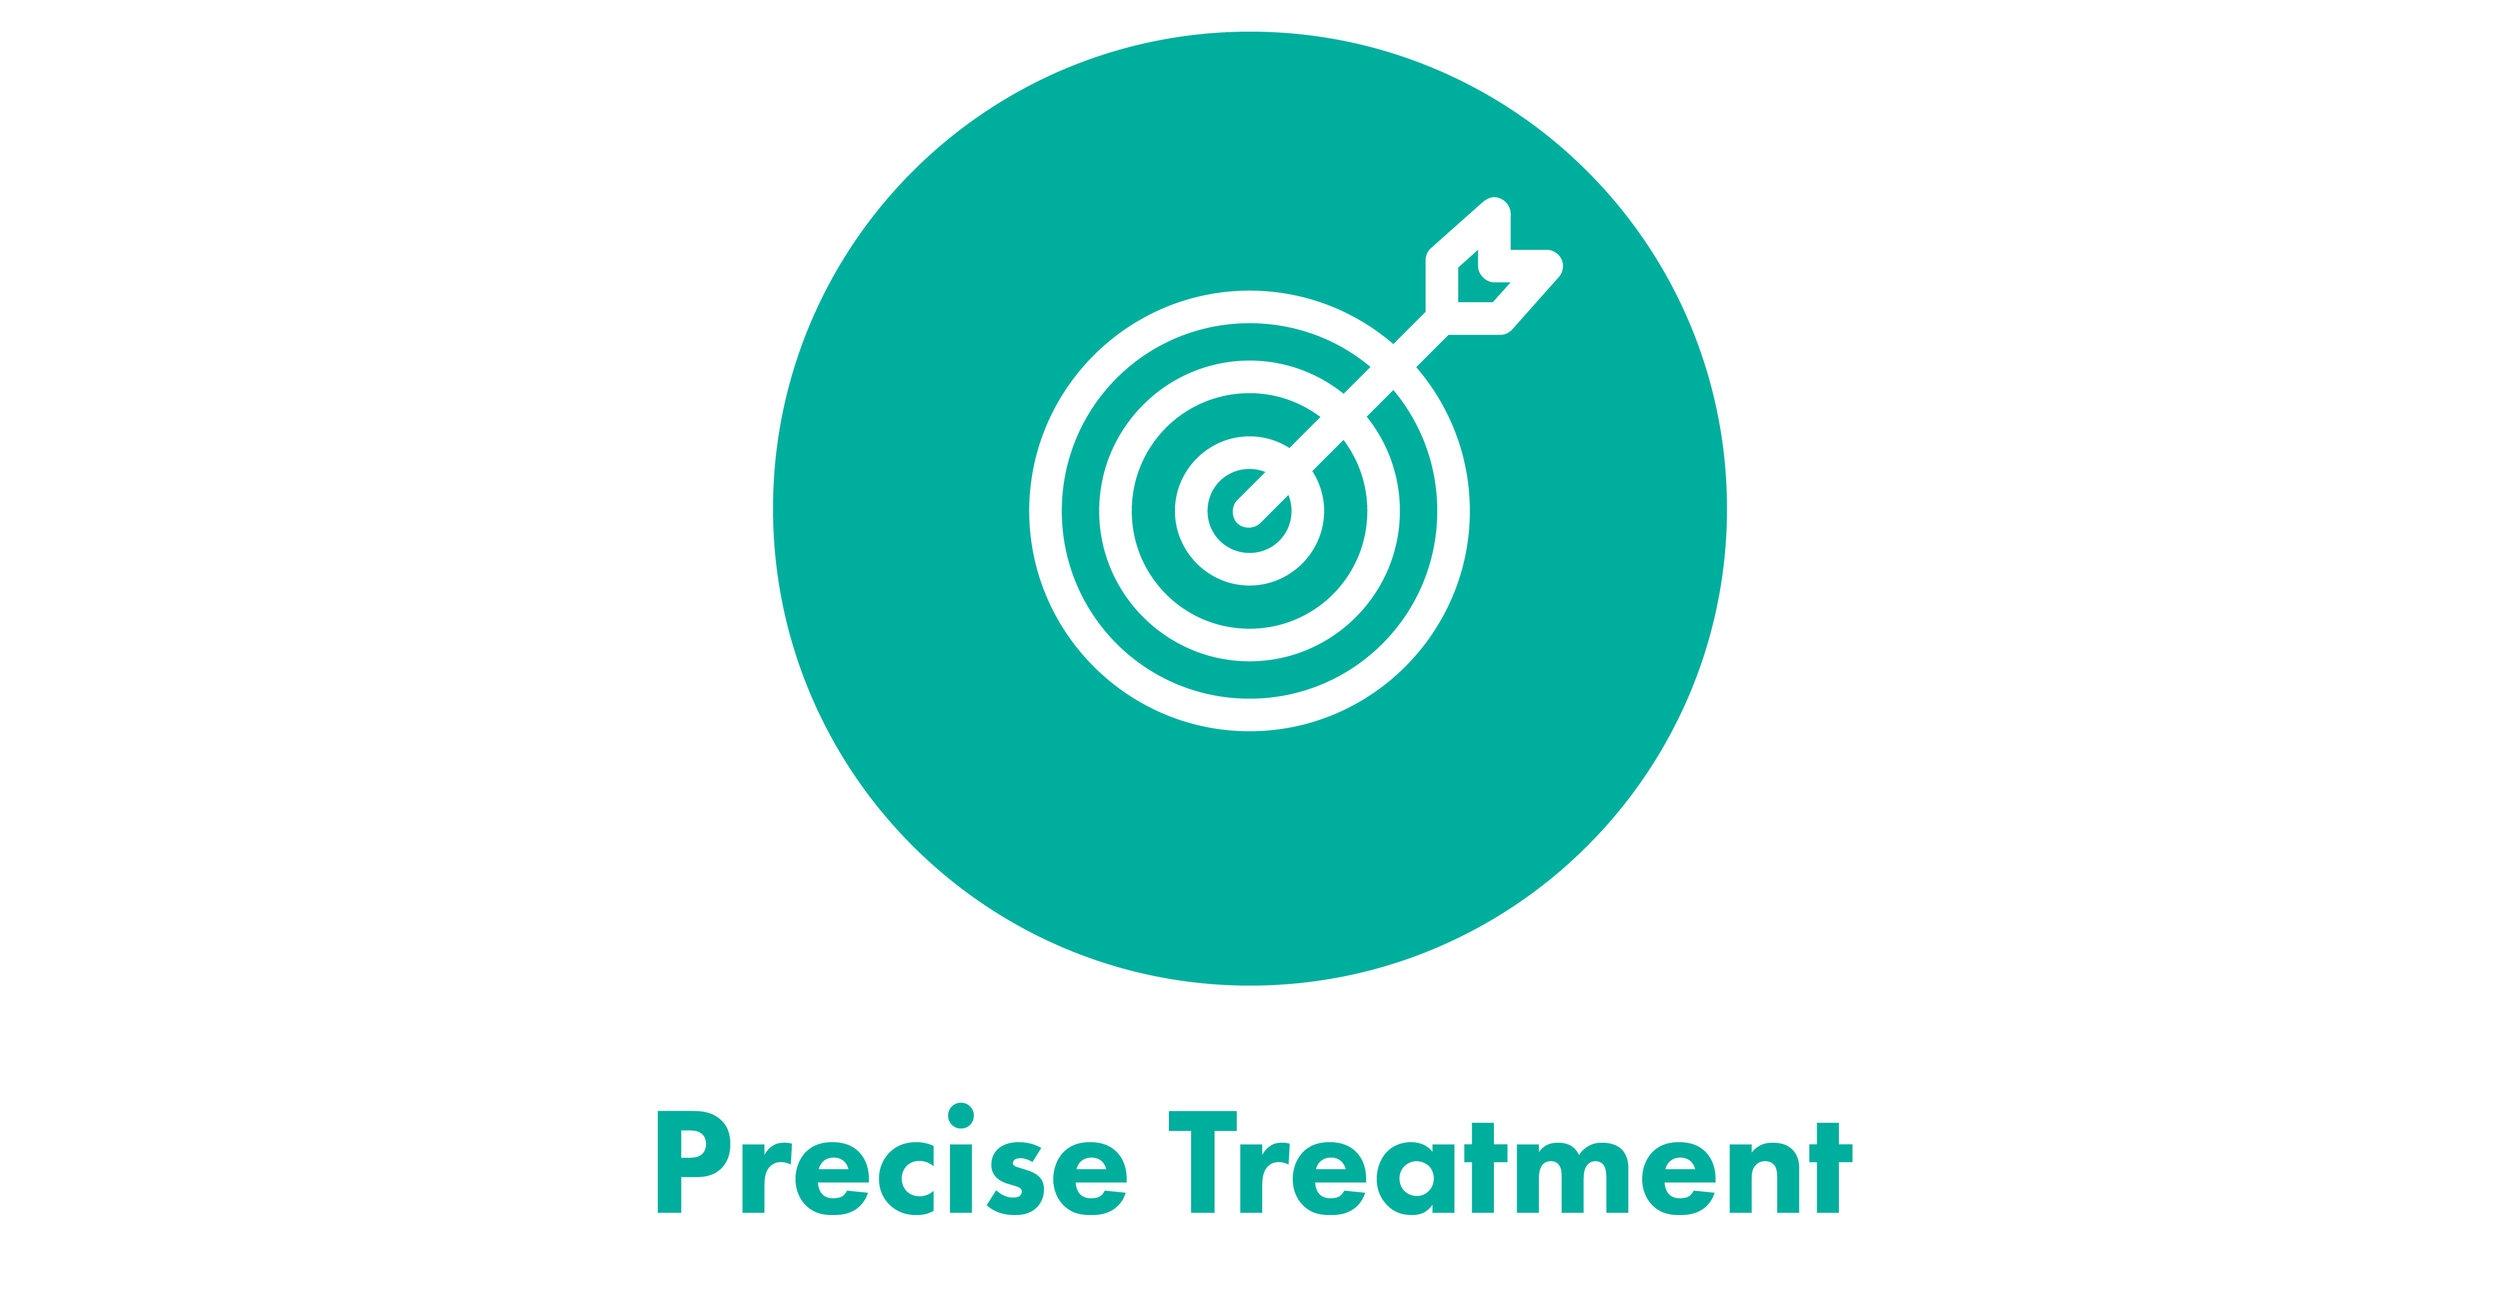 Precise Treatment-01.jpg